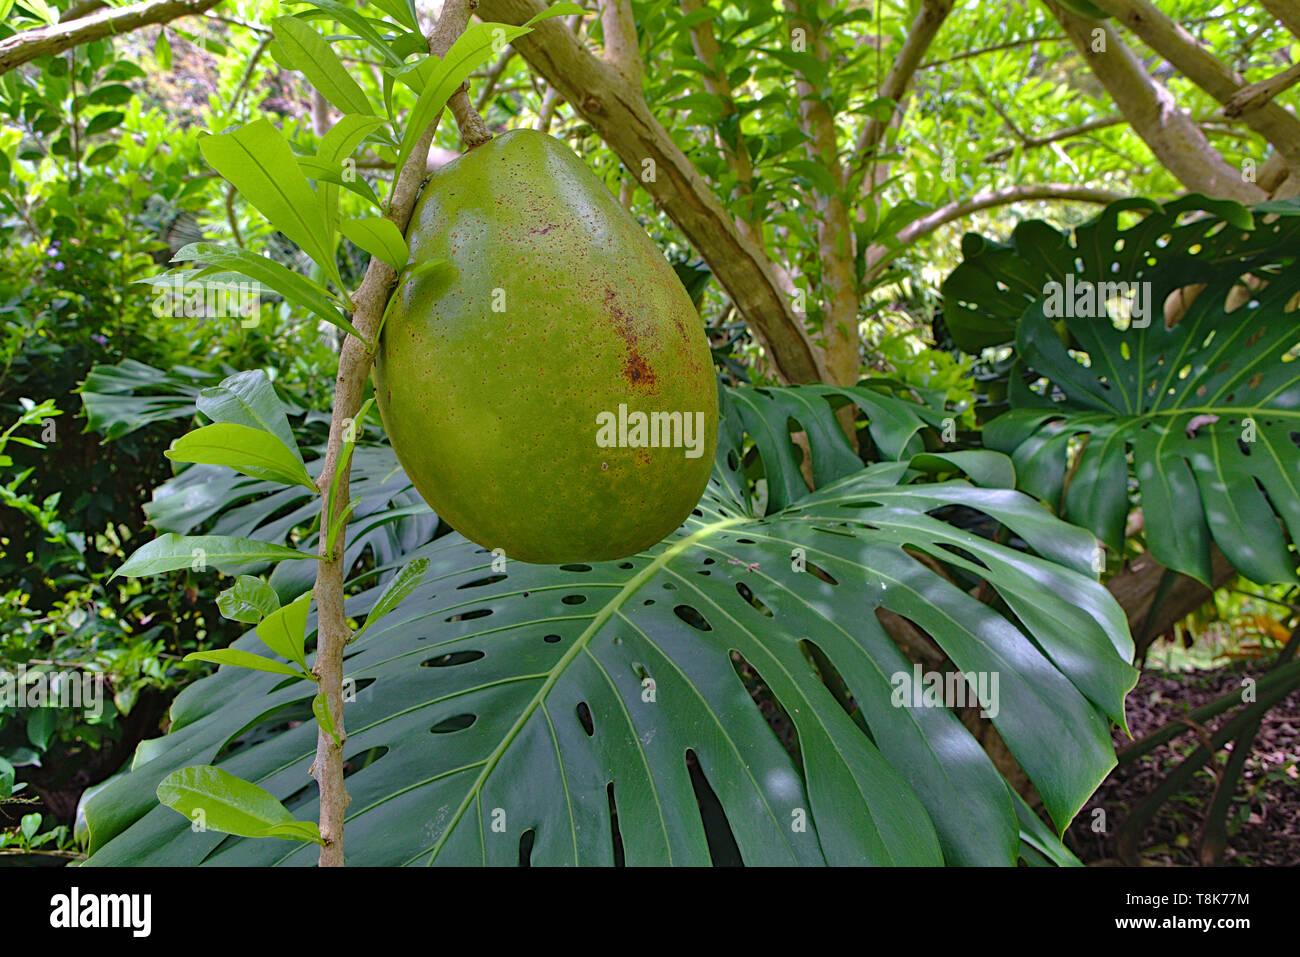 calabash fruit and monstera leaf - Stock Image